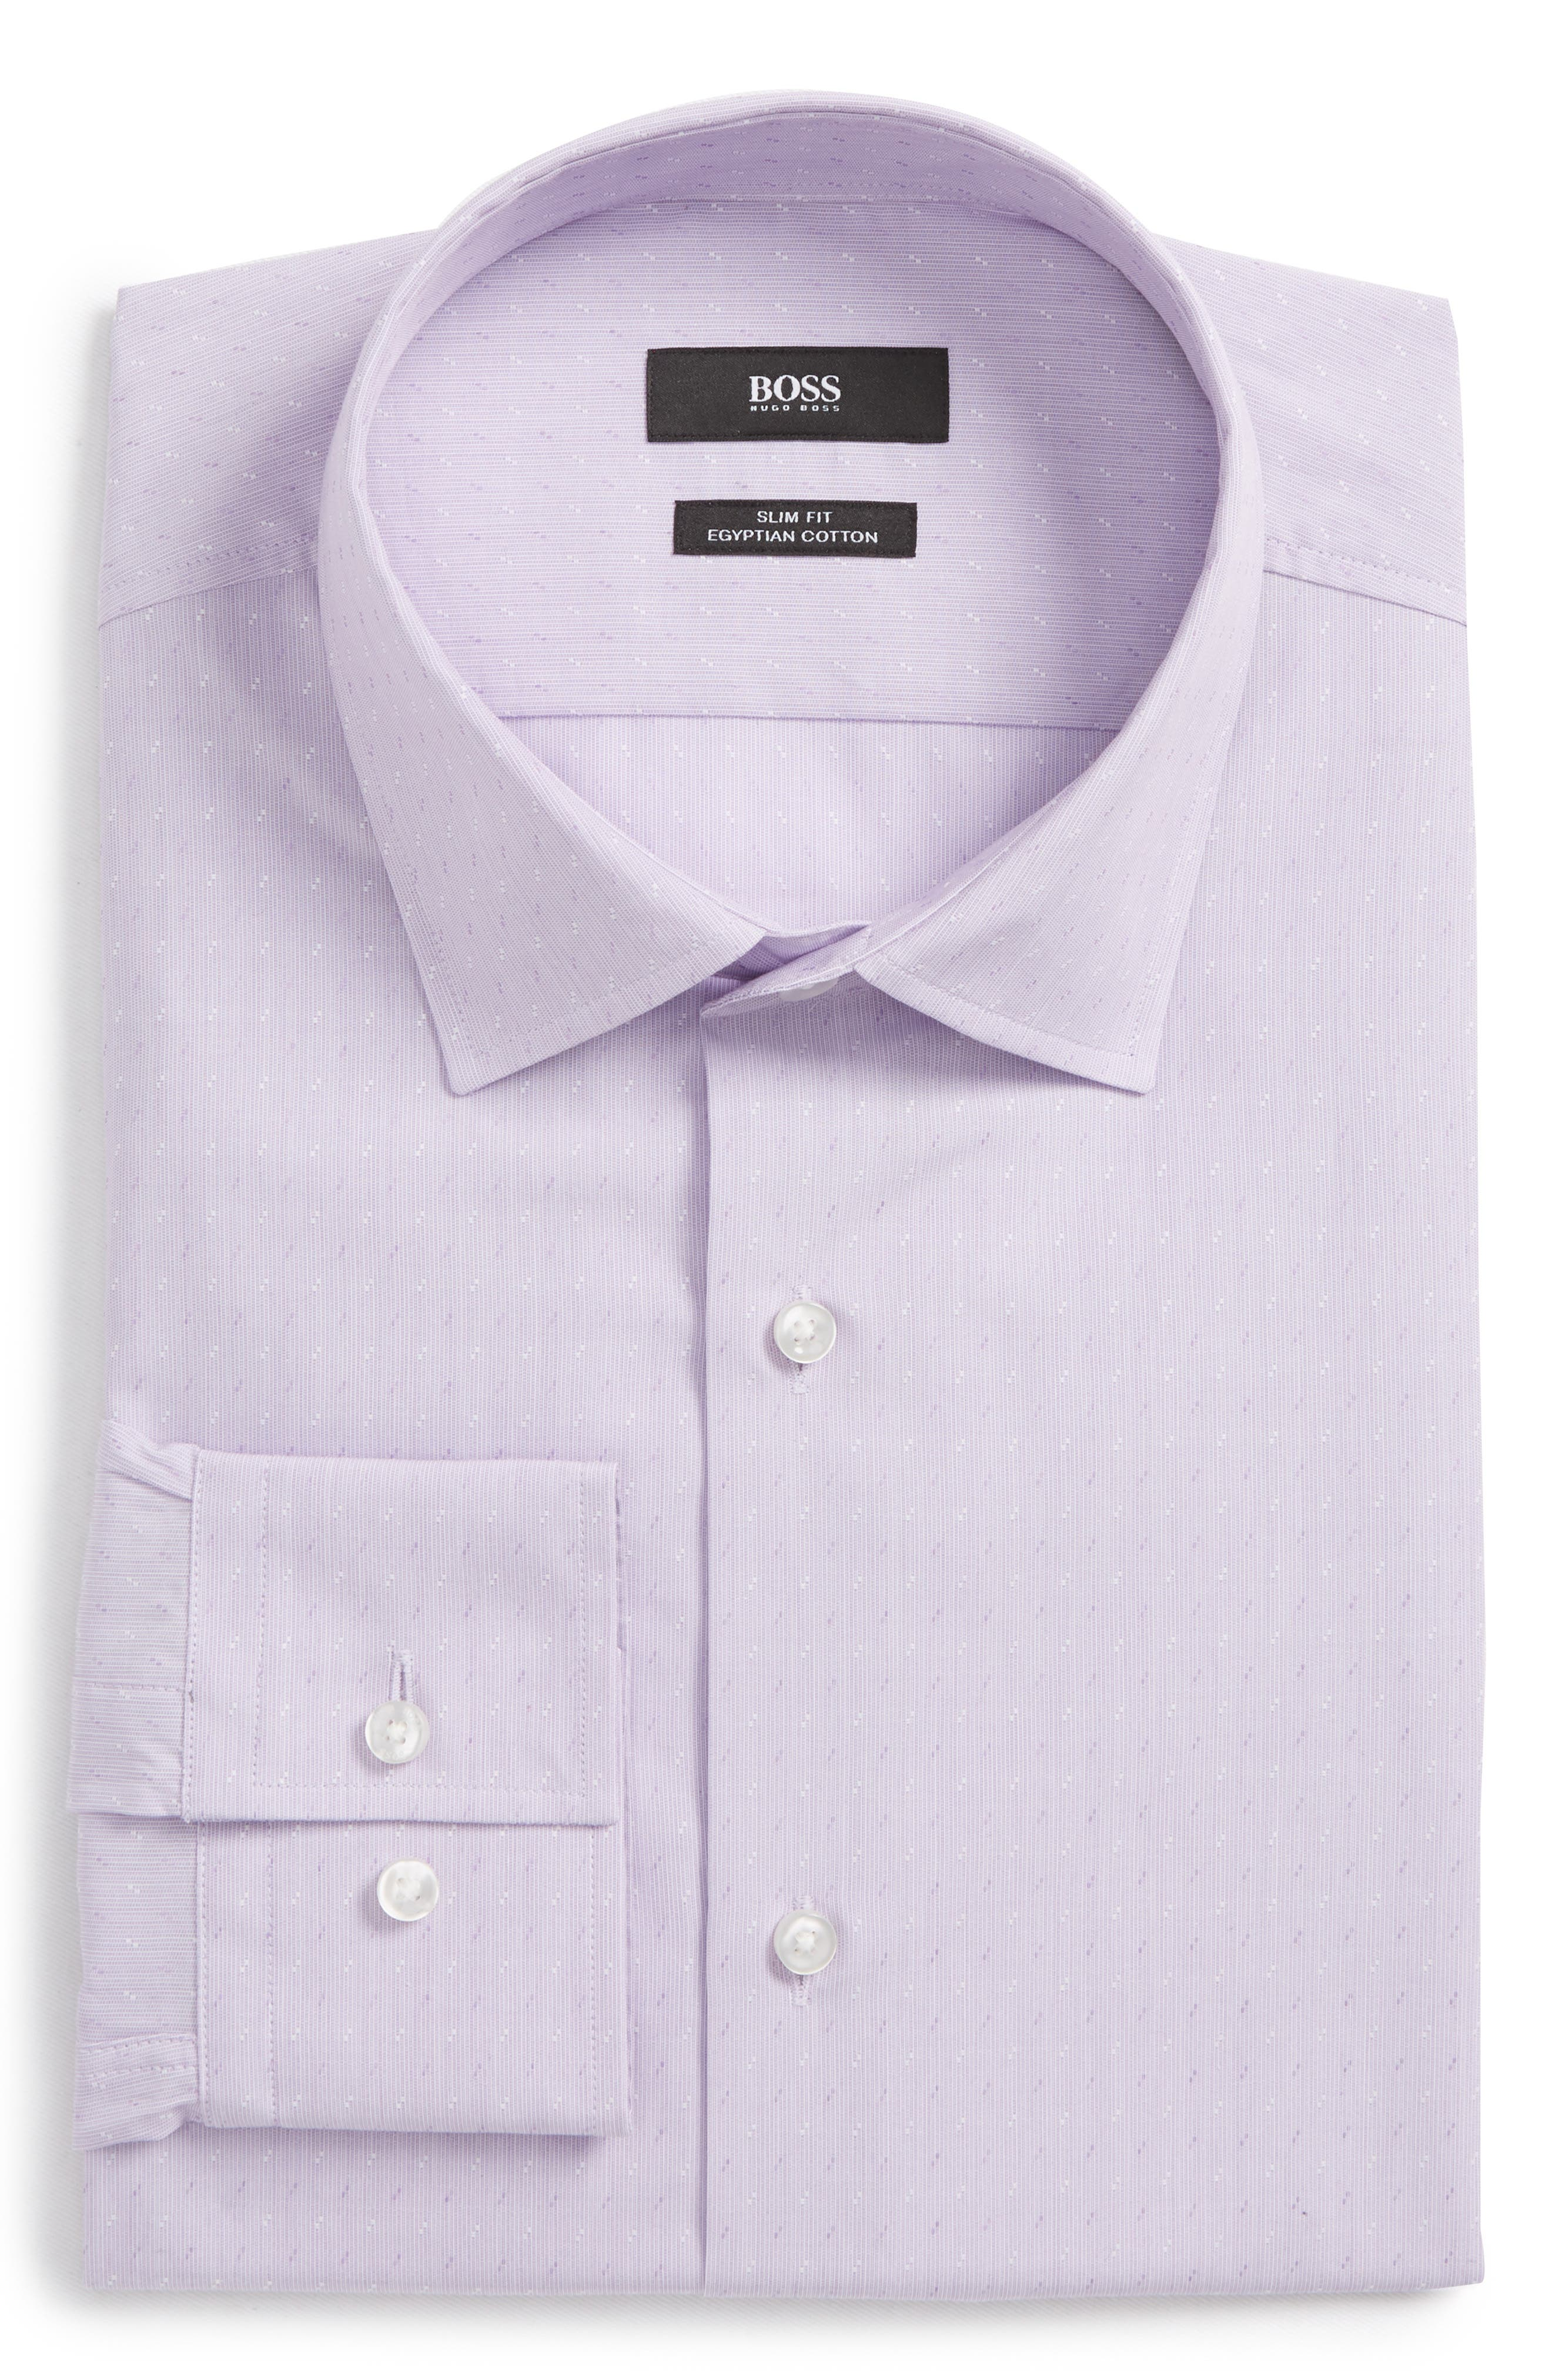 BOSS Jenno Slim Fit Dress Shirt